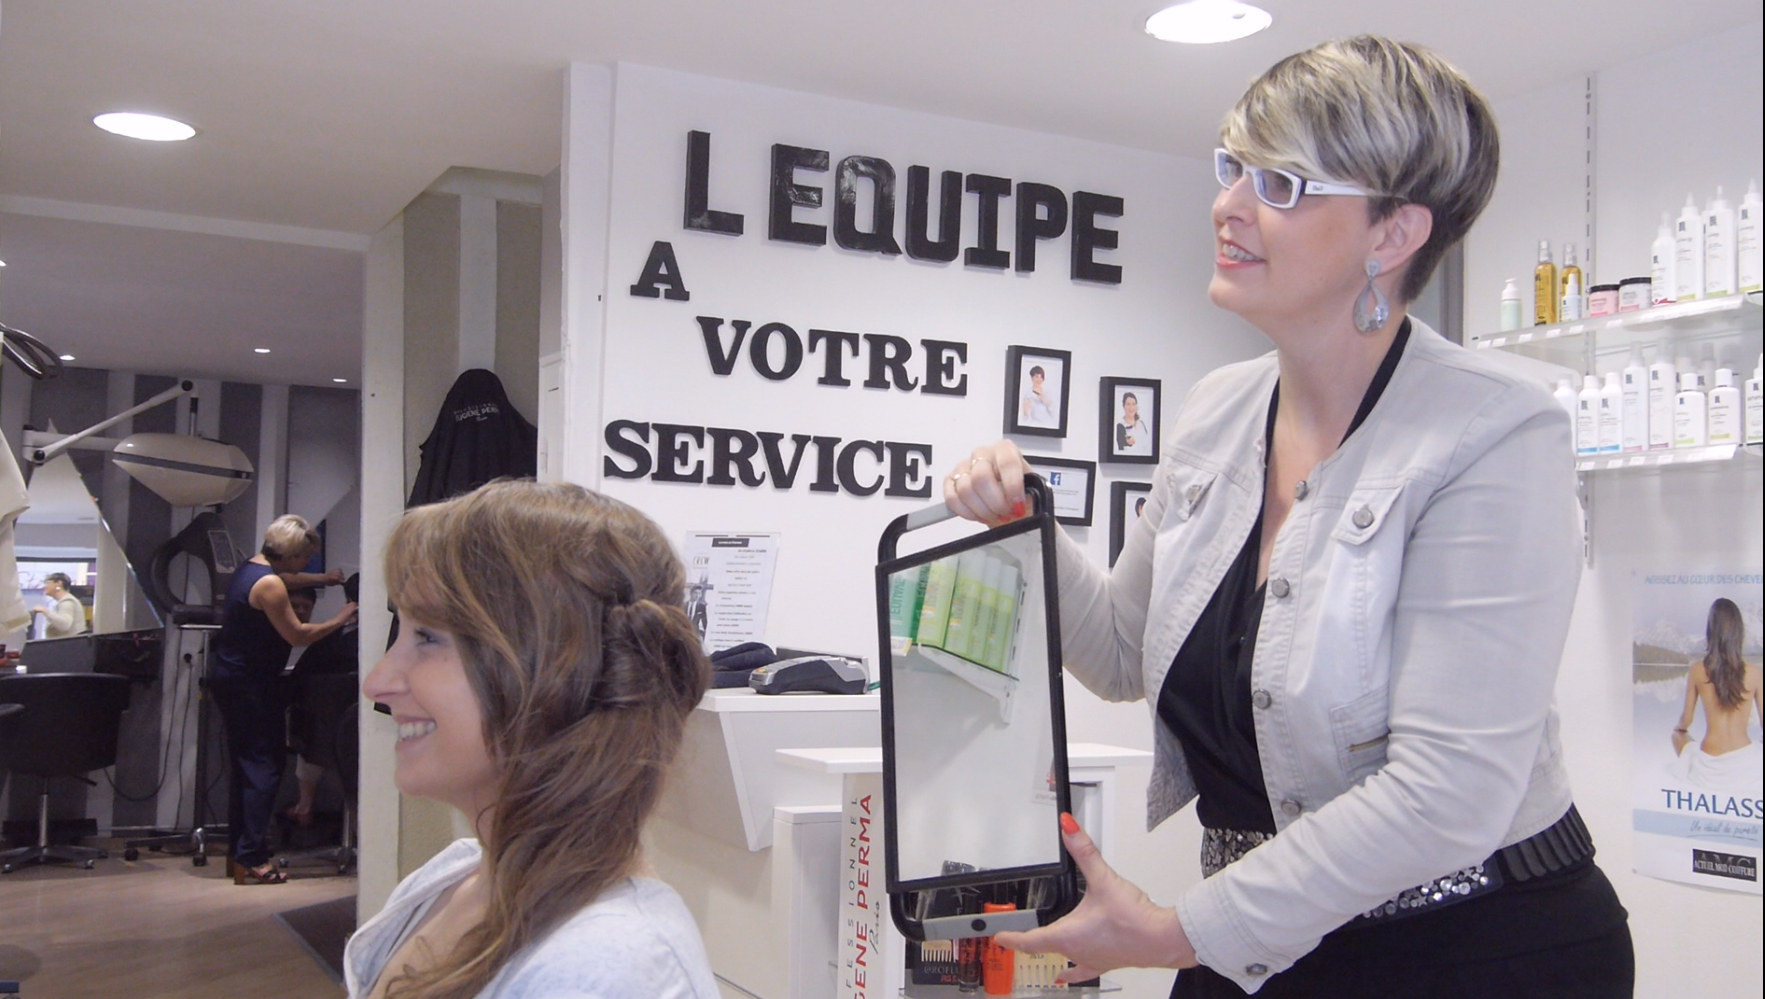 Actuel mod coiffure castelactiv 39 for Garage peugeot chateaugiron